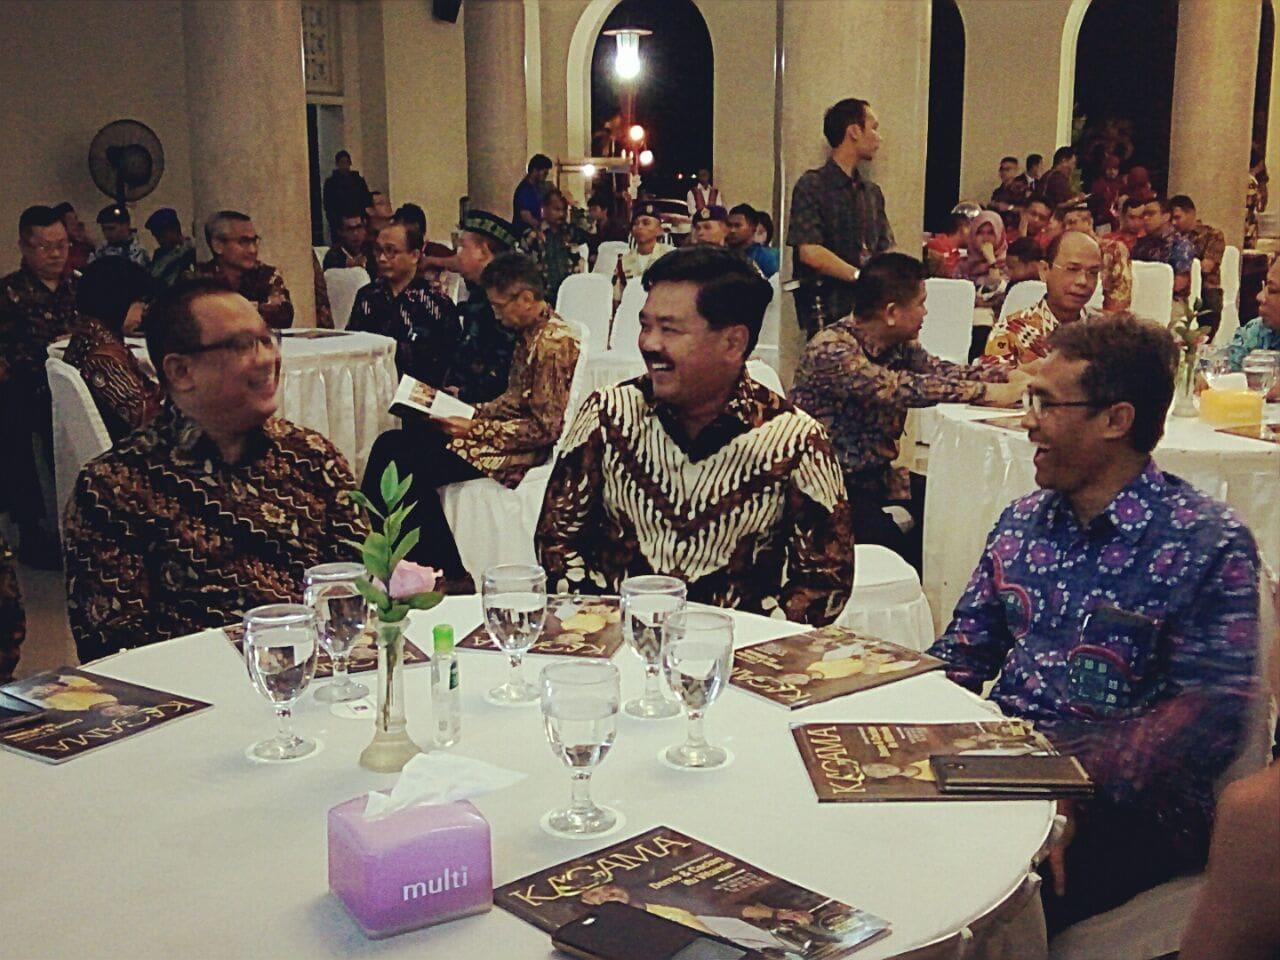 Kasau : 17 Perwira TNI AU Kuliah di UGM Program S2 dan S3 Yogyakarta